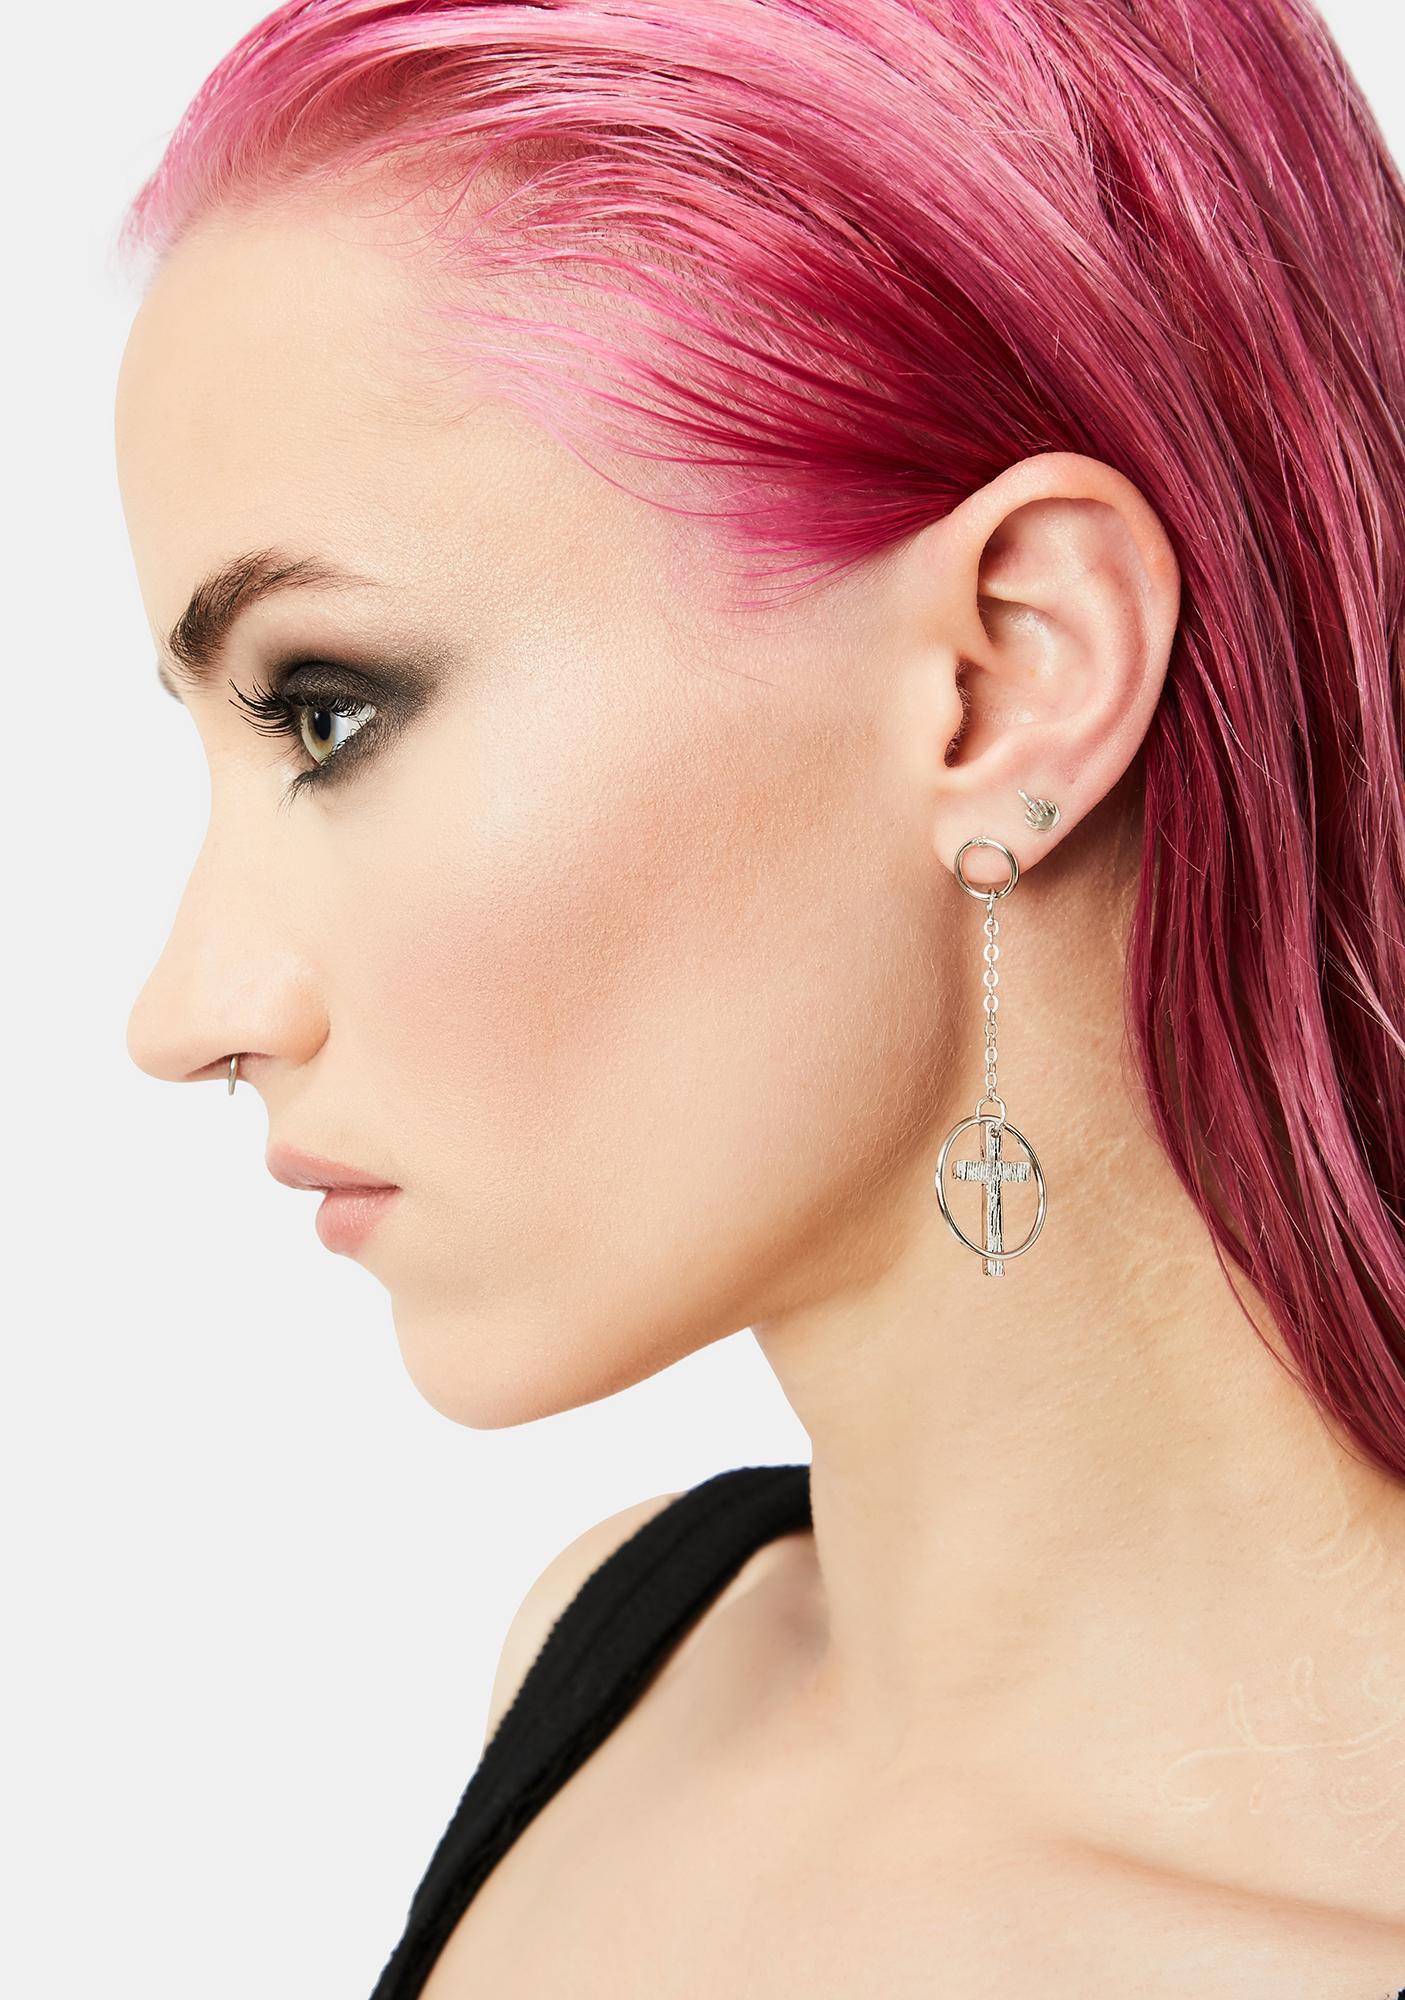 Supernatural Charms Earring Set